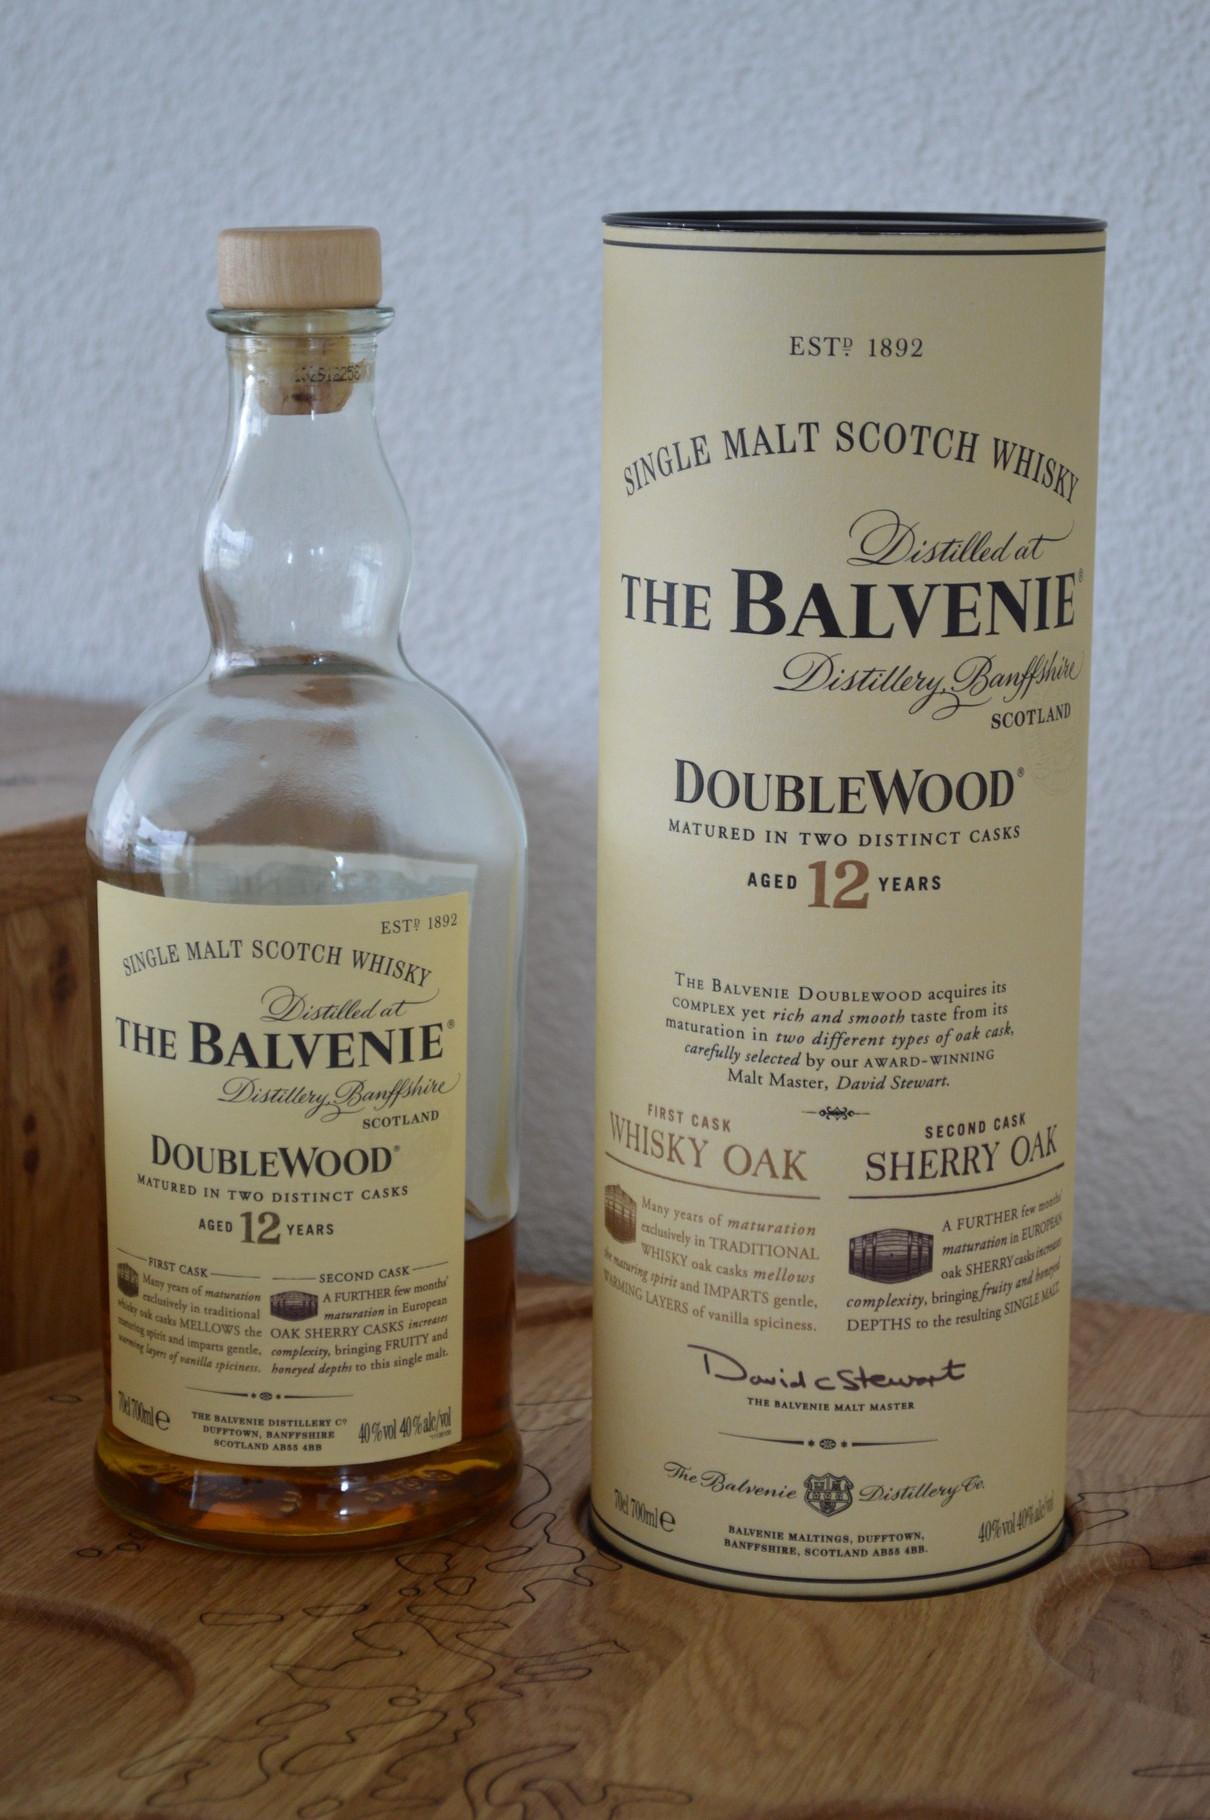 SPEYSIDE - The Balvenie* - Aged: 12 years - Bottler: Original - 70cl - 40% - Double Wood